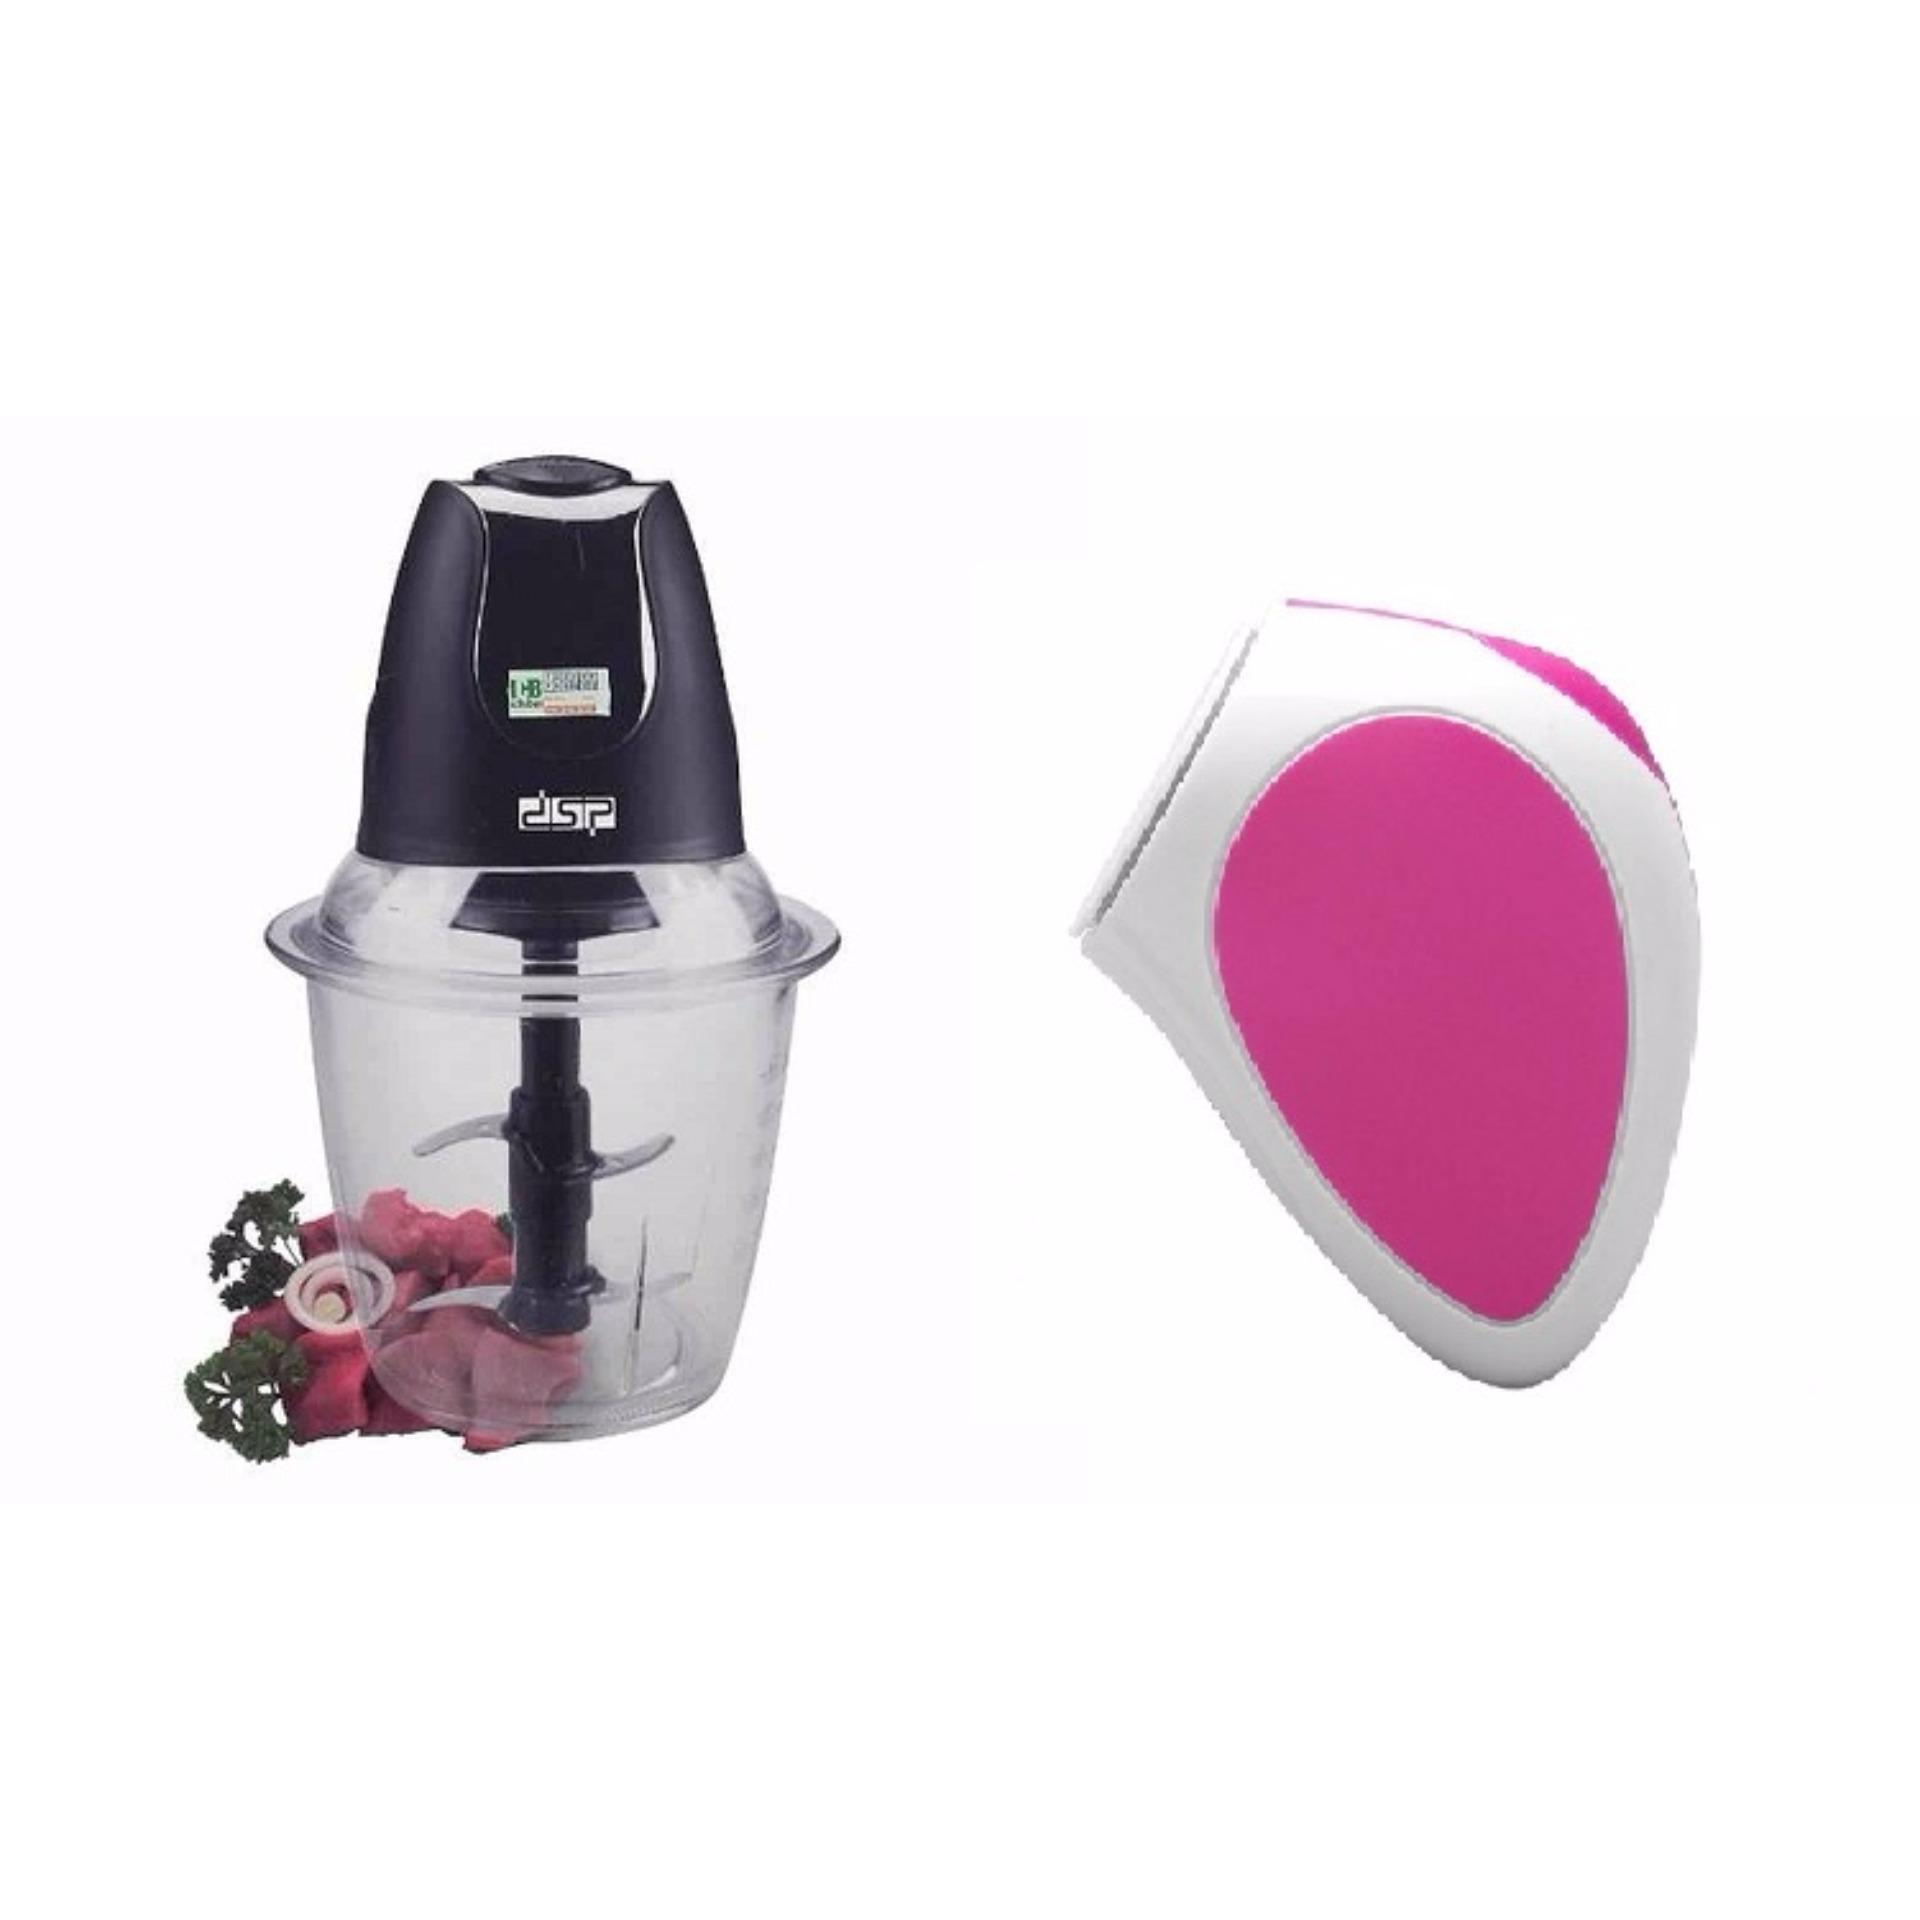 Máy xay thịt cối thủy tinh Food Chopper + Tặng máy massage rửa mặt